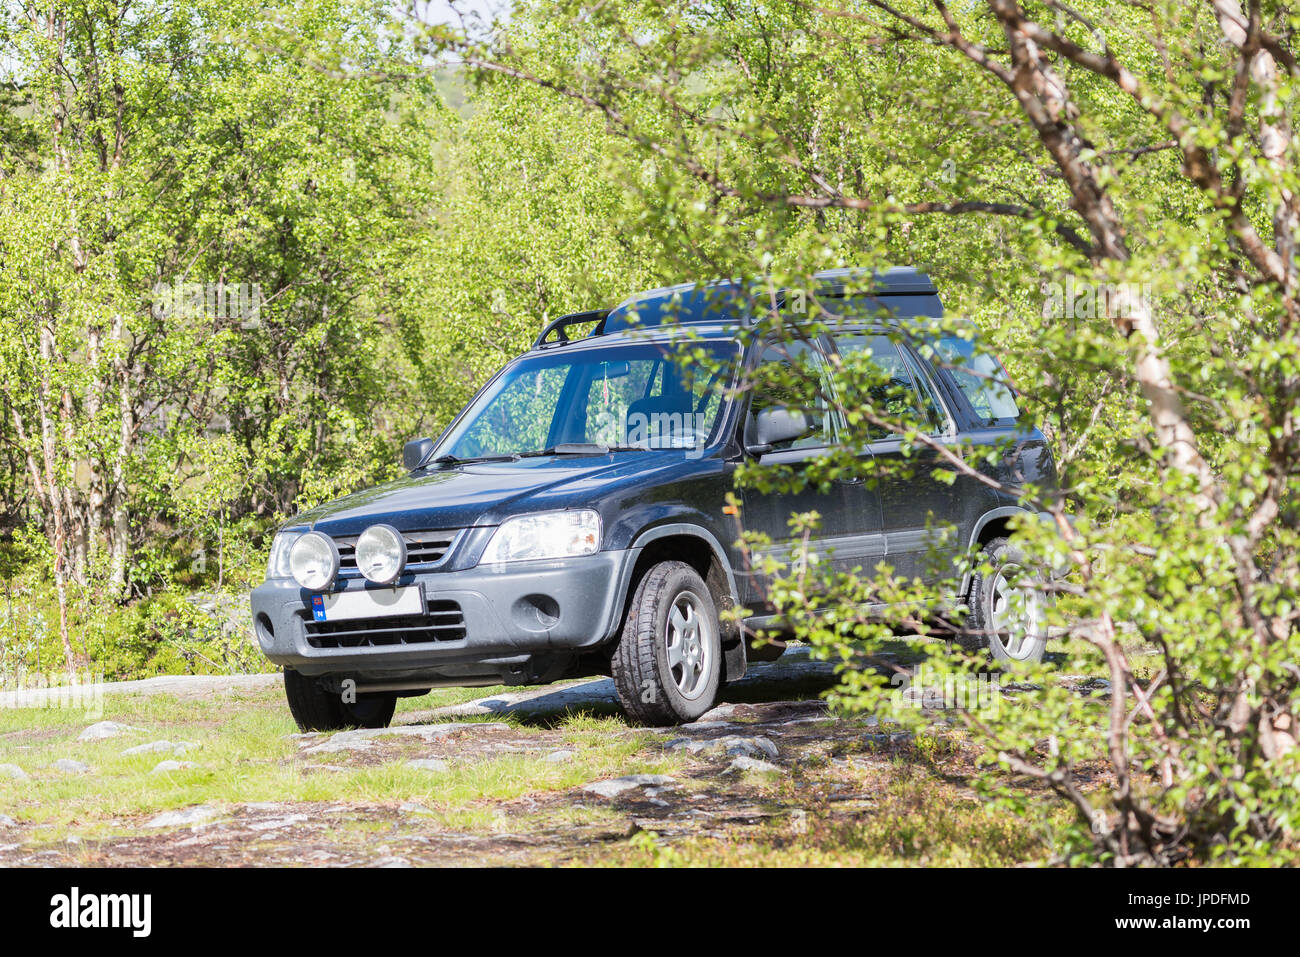 Honda crv parked offroad - Stock Image